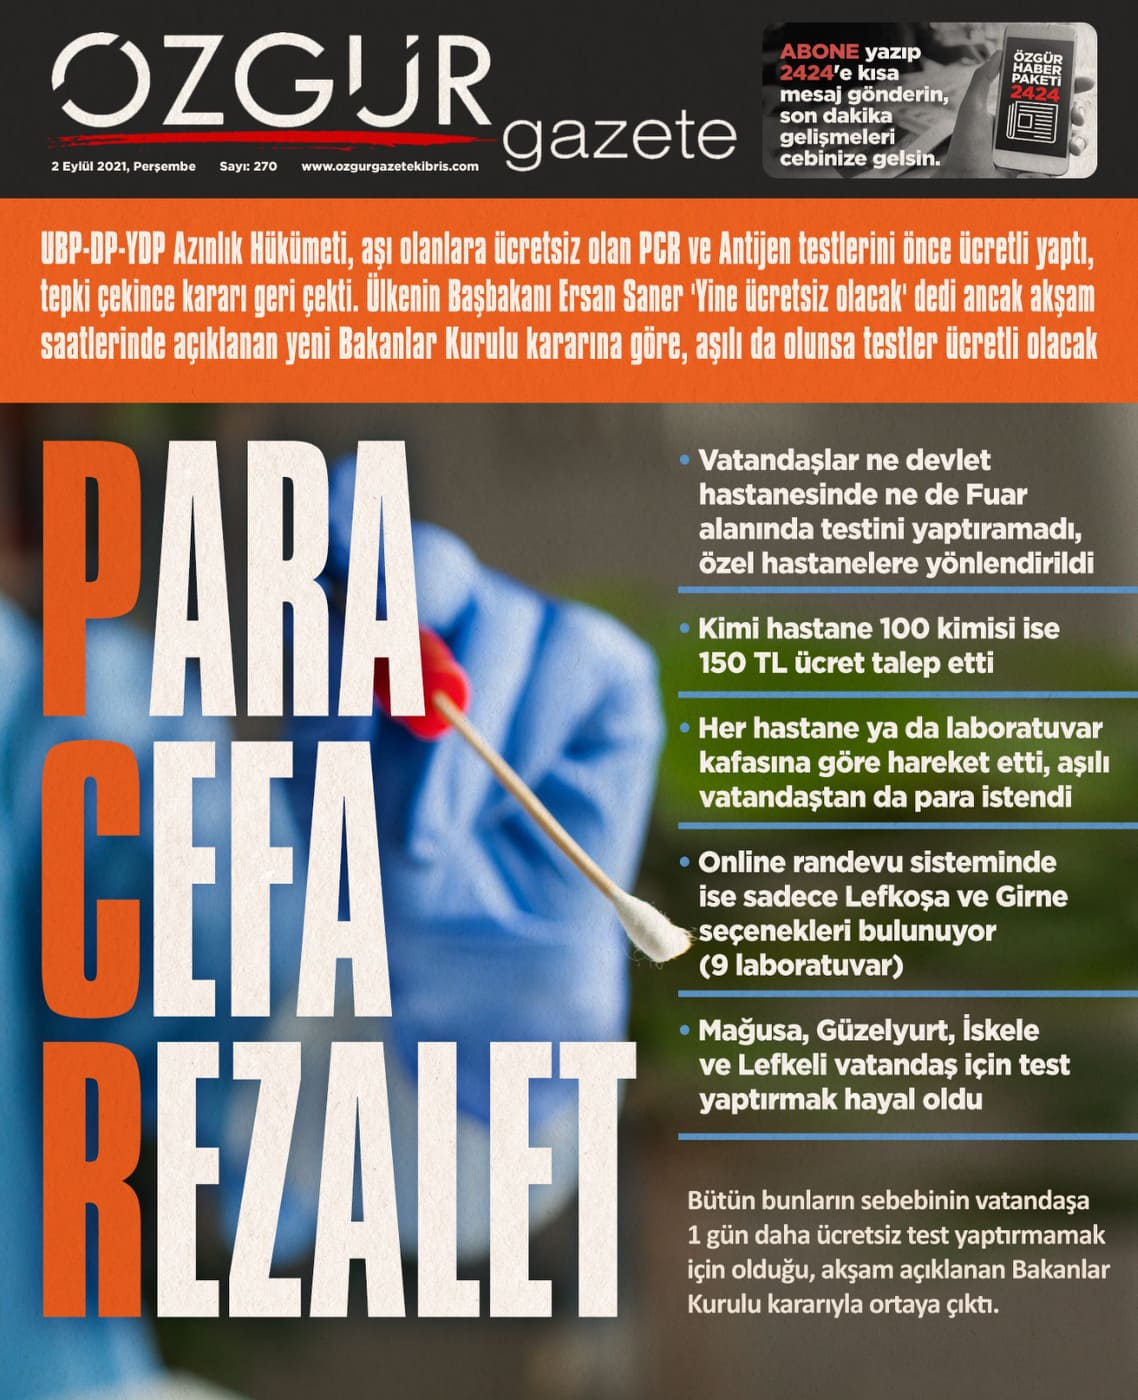 ozgur_gazete_kibris_manset_test_ucretli